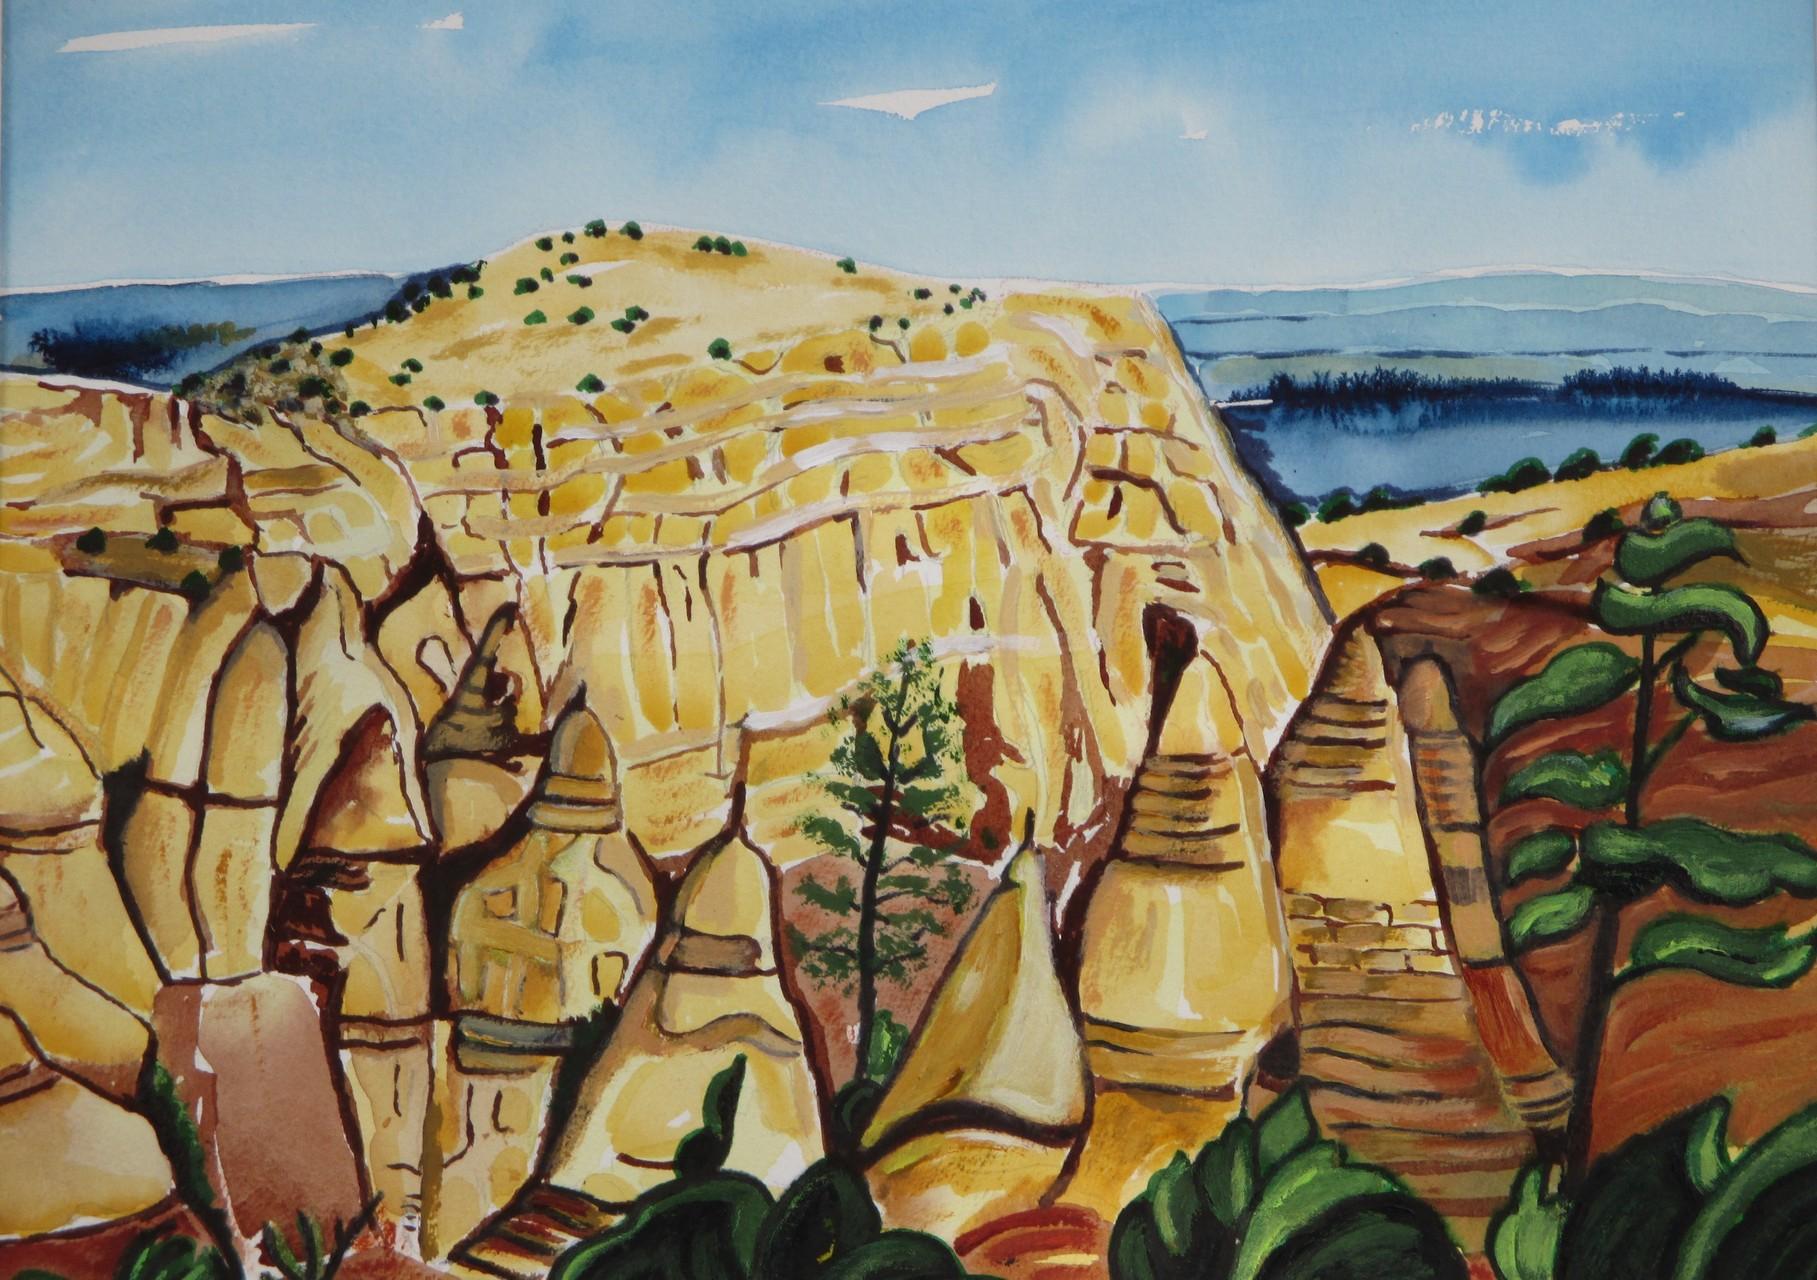 Tent Rocks, watercolor, 15.5 x 11.5, SOLD